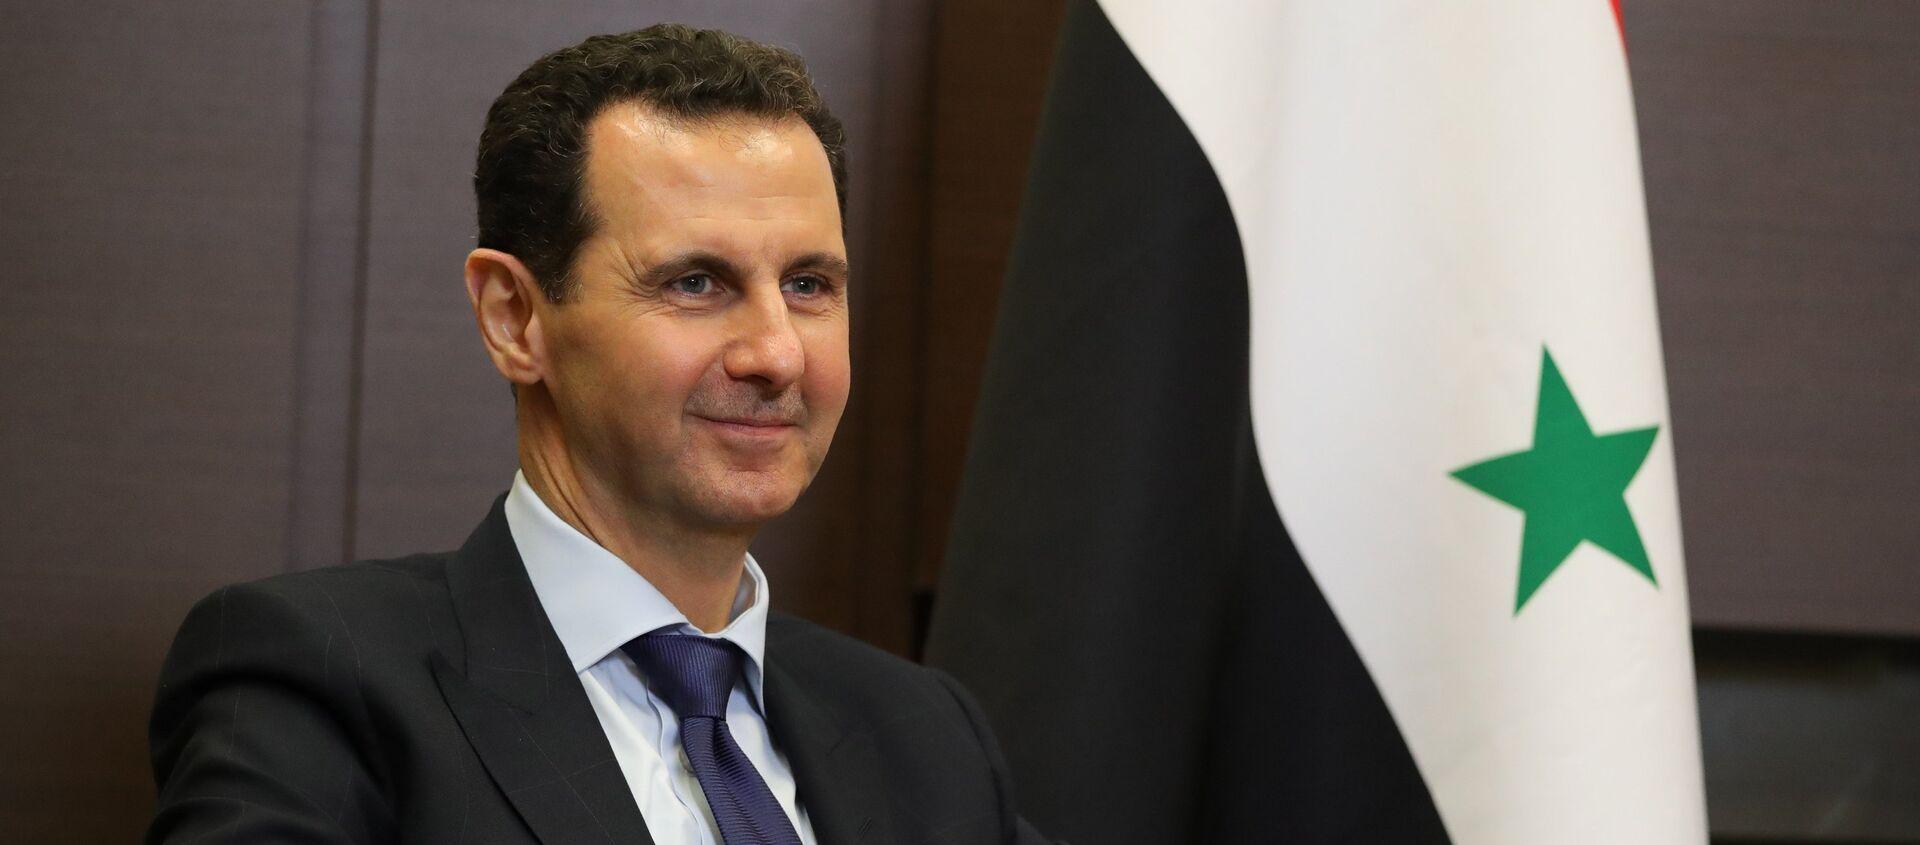 Tổng thống Syria Bashar Assad - Sputnik Việt Nam, 1920, 28.05.2021